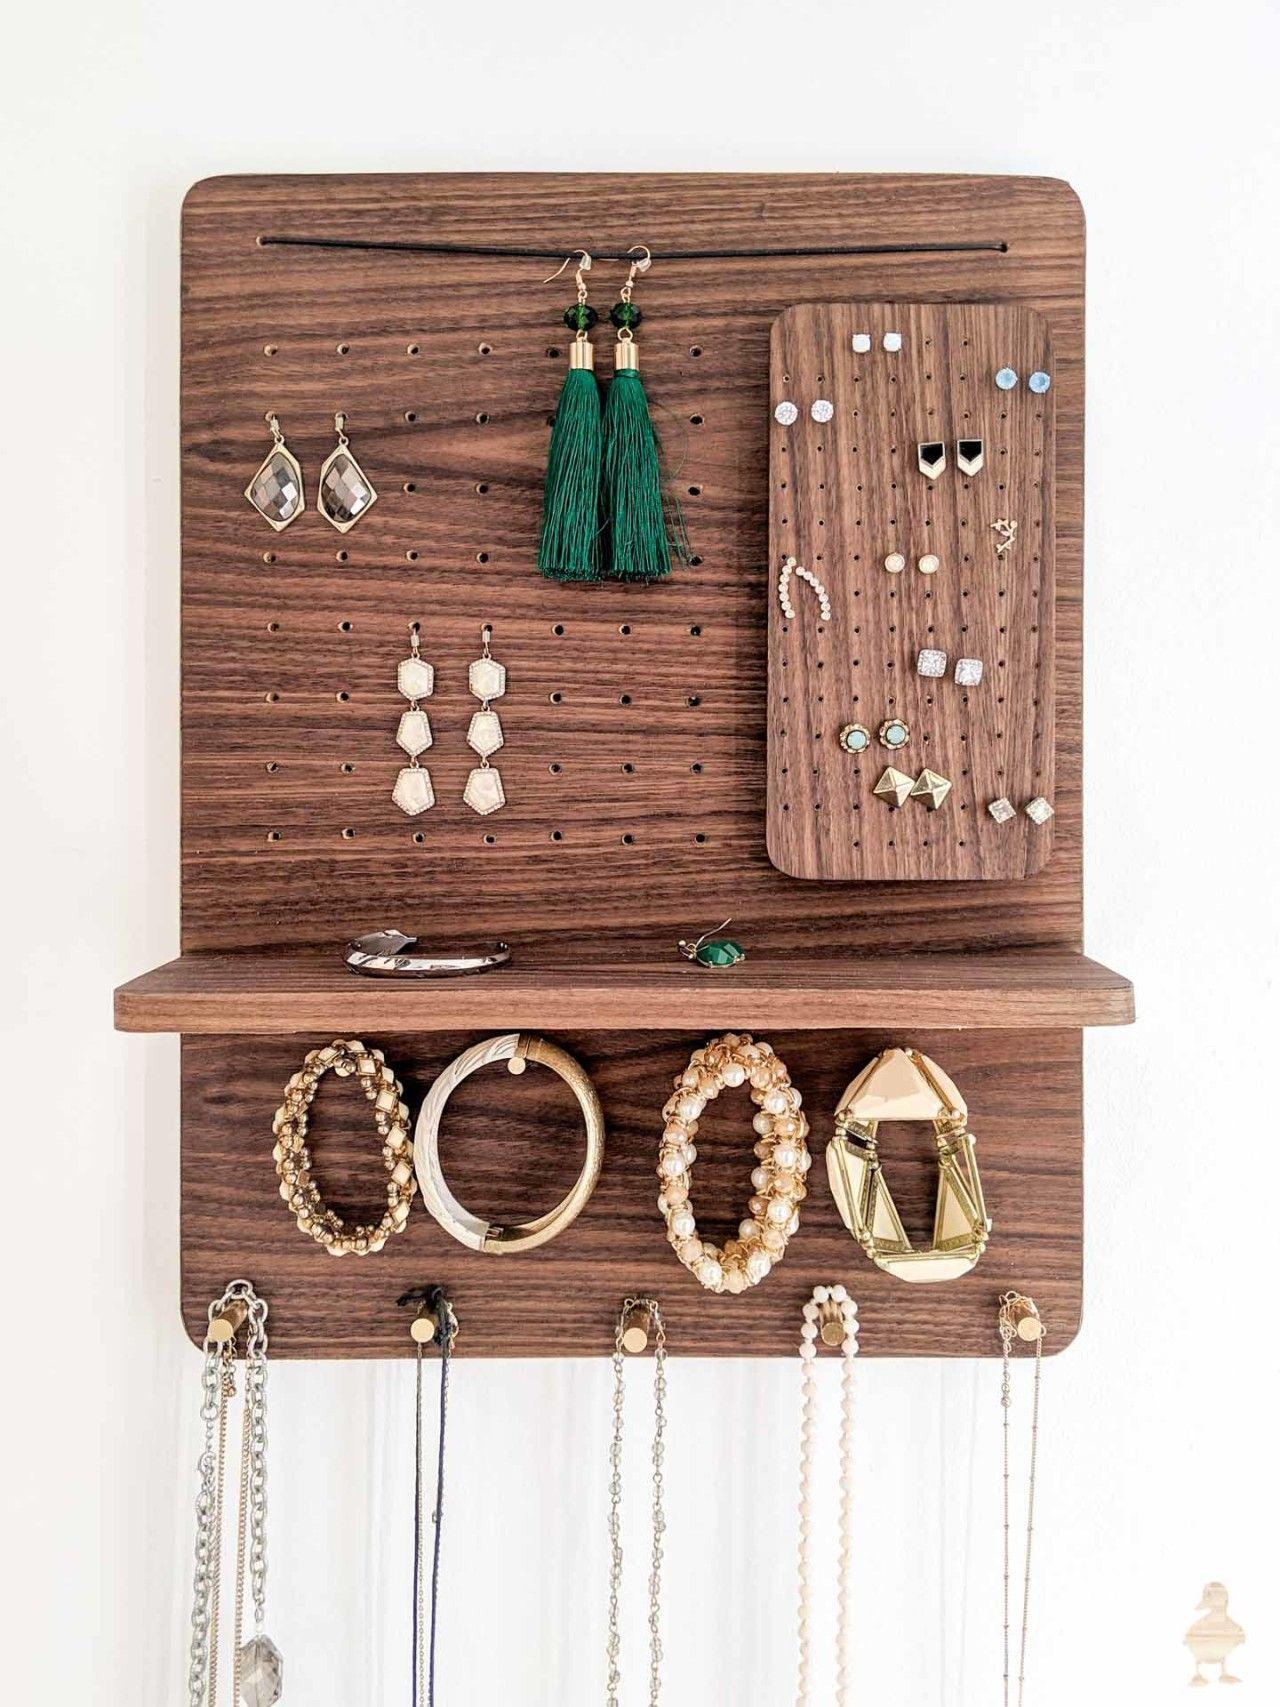 necklace holder Jewelry Holder Jewelry Rack jewelry hooks Mother/'s day gift jewelry storage daughter gift jewelry organizer